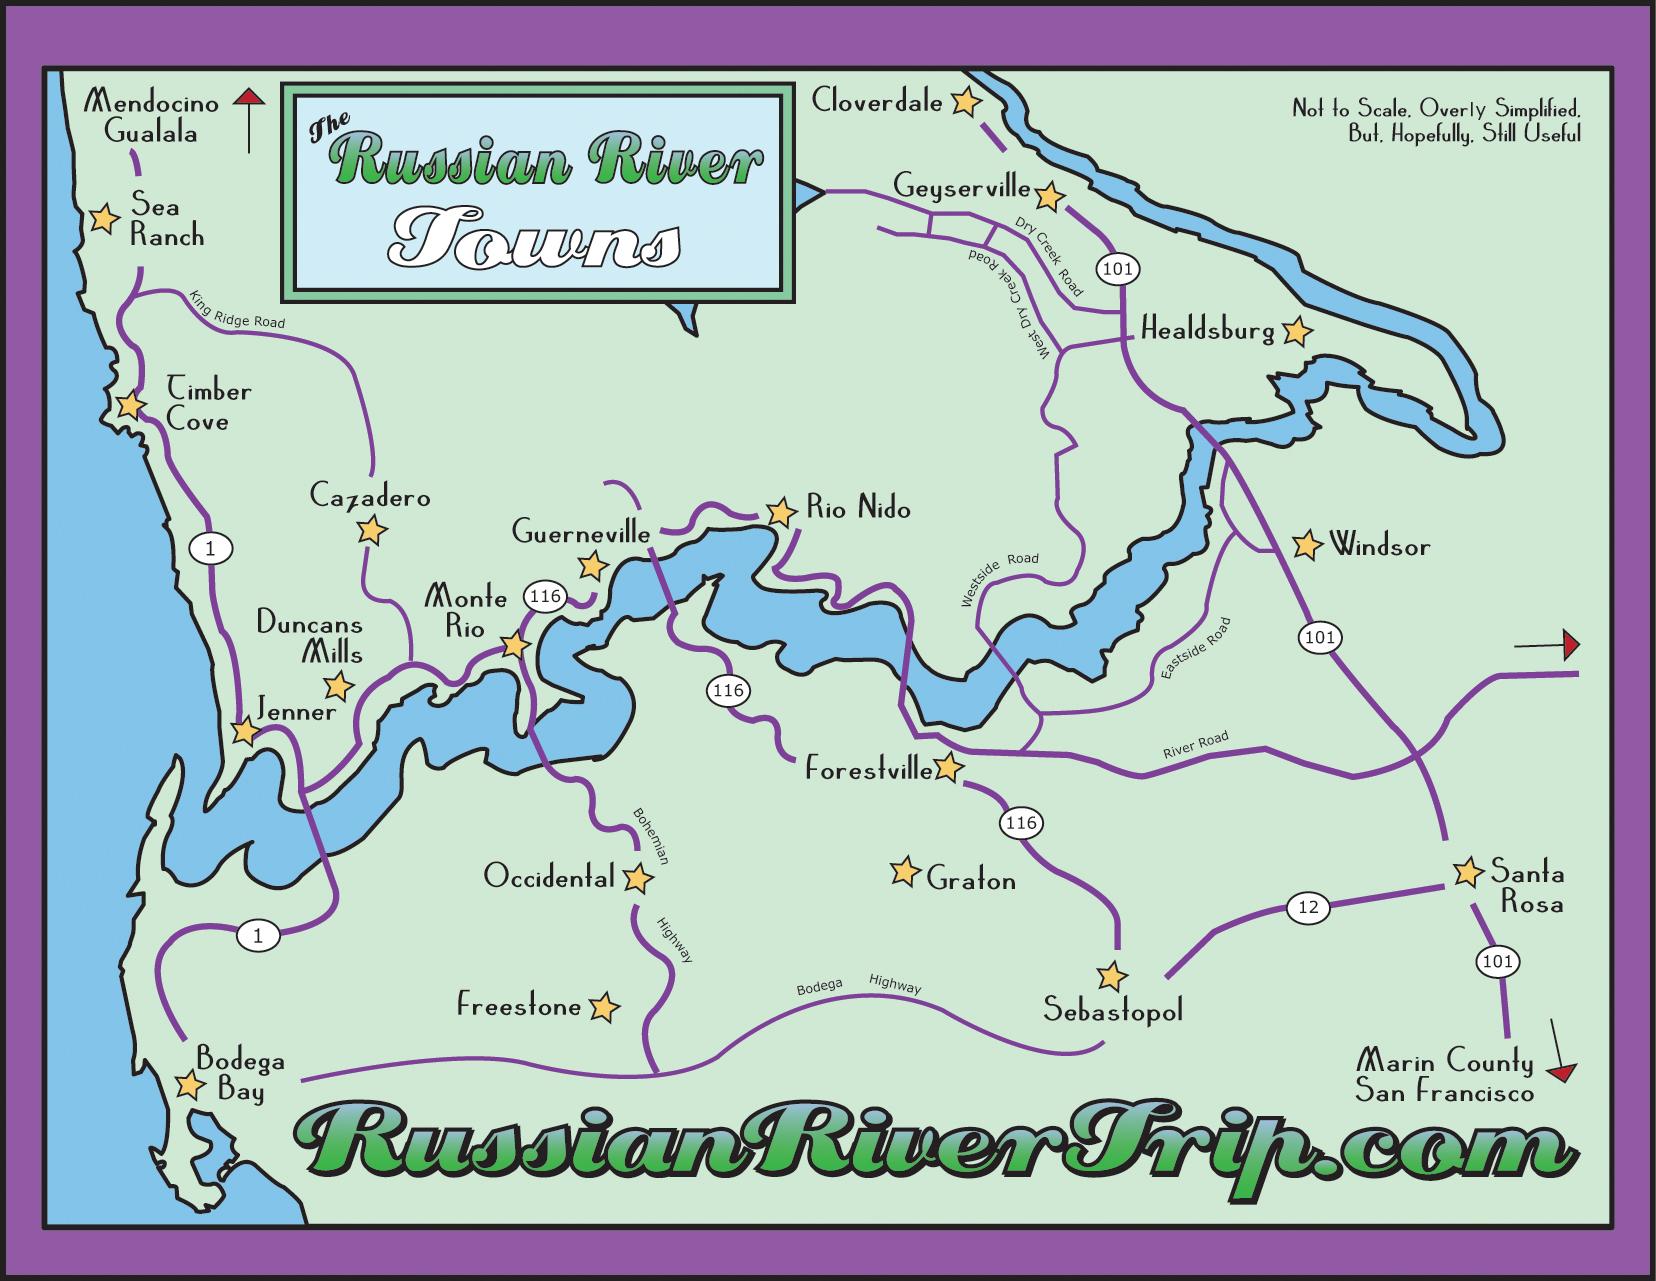 Maps Russianrivertrip Com